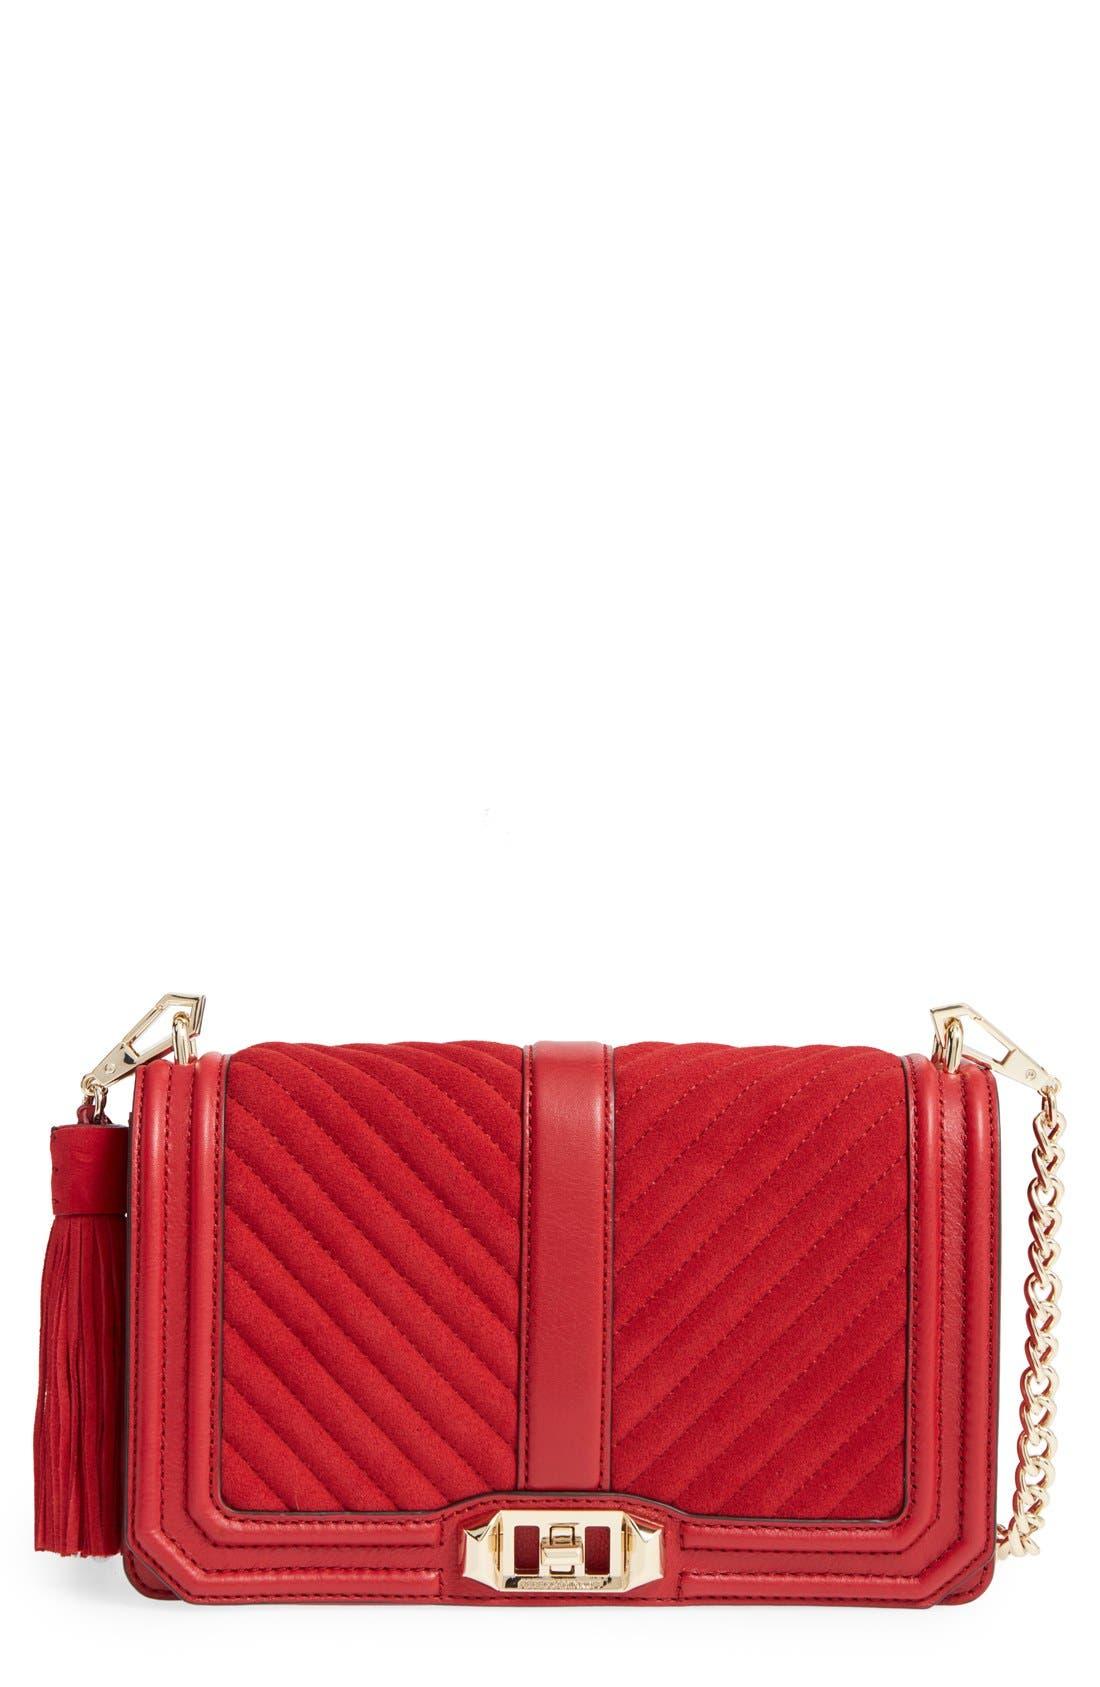 Alternate Image 1 Selected - Rebecca Minkoff Love Crossbody Bag